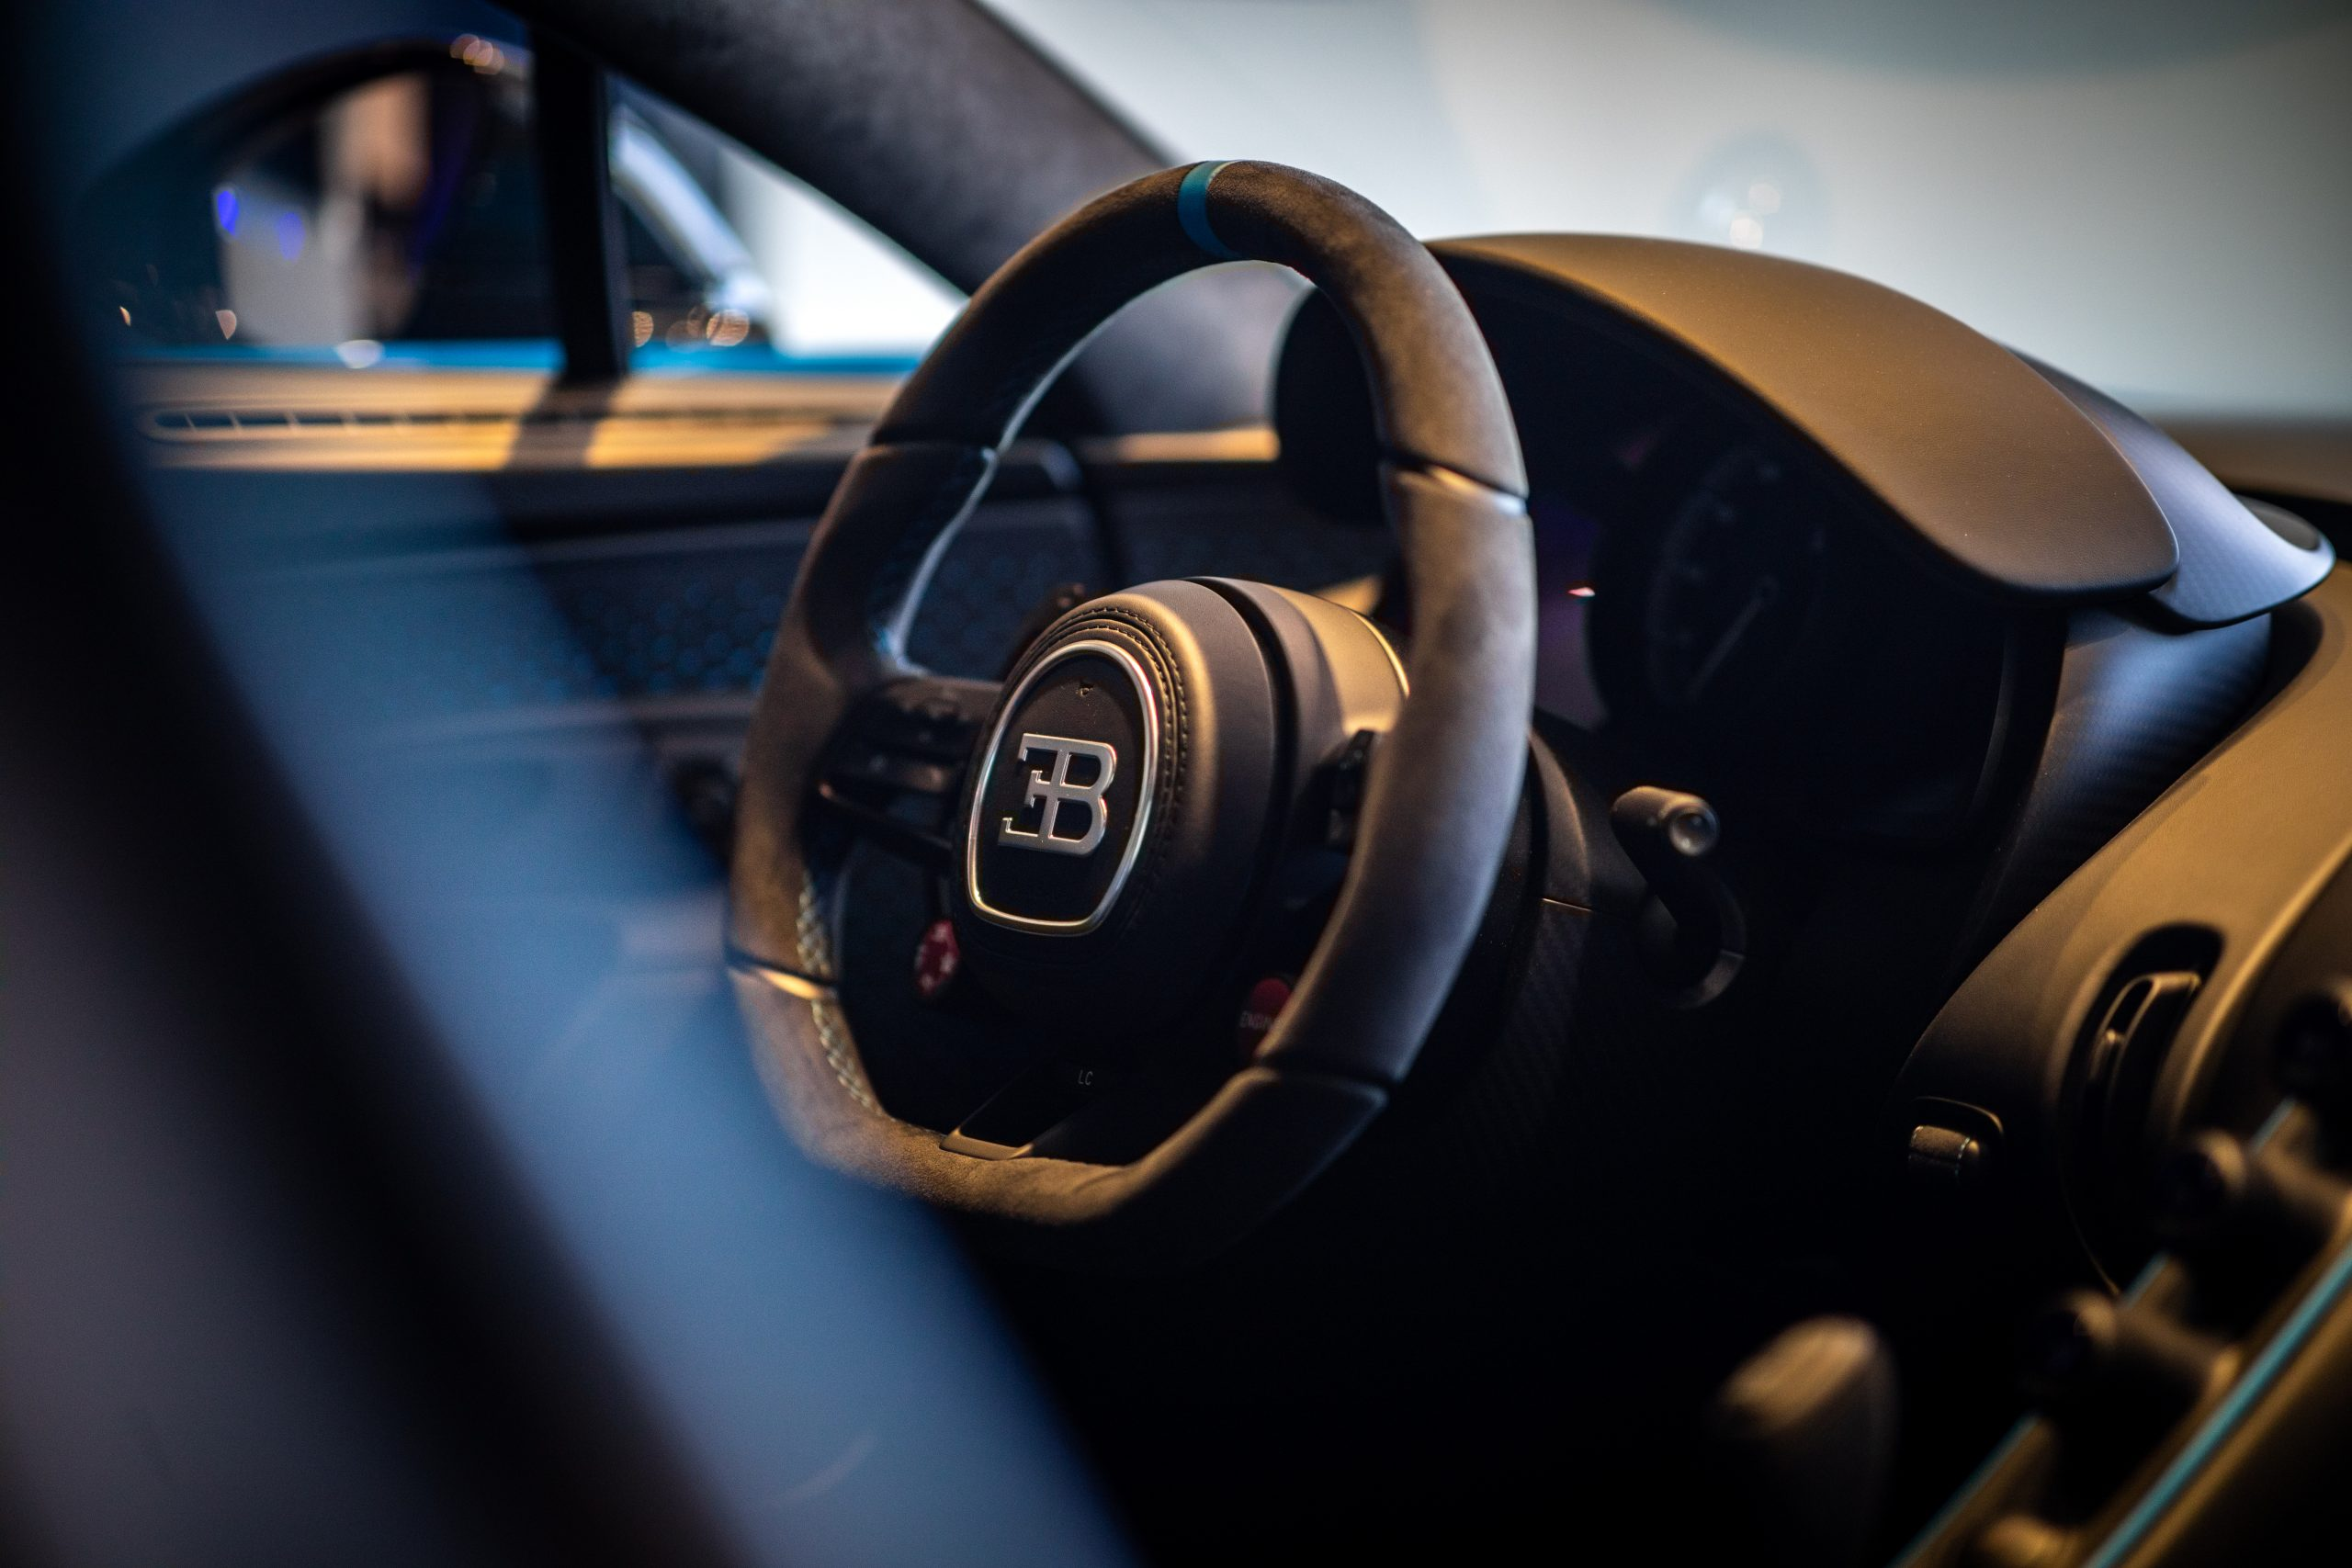 Bugatti-Chiron-Pur-Sport-show-car-4